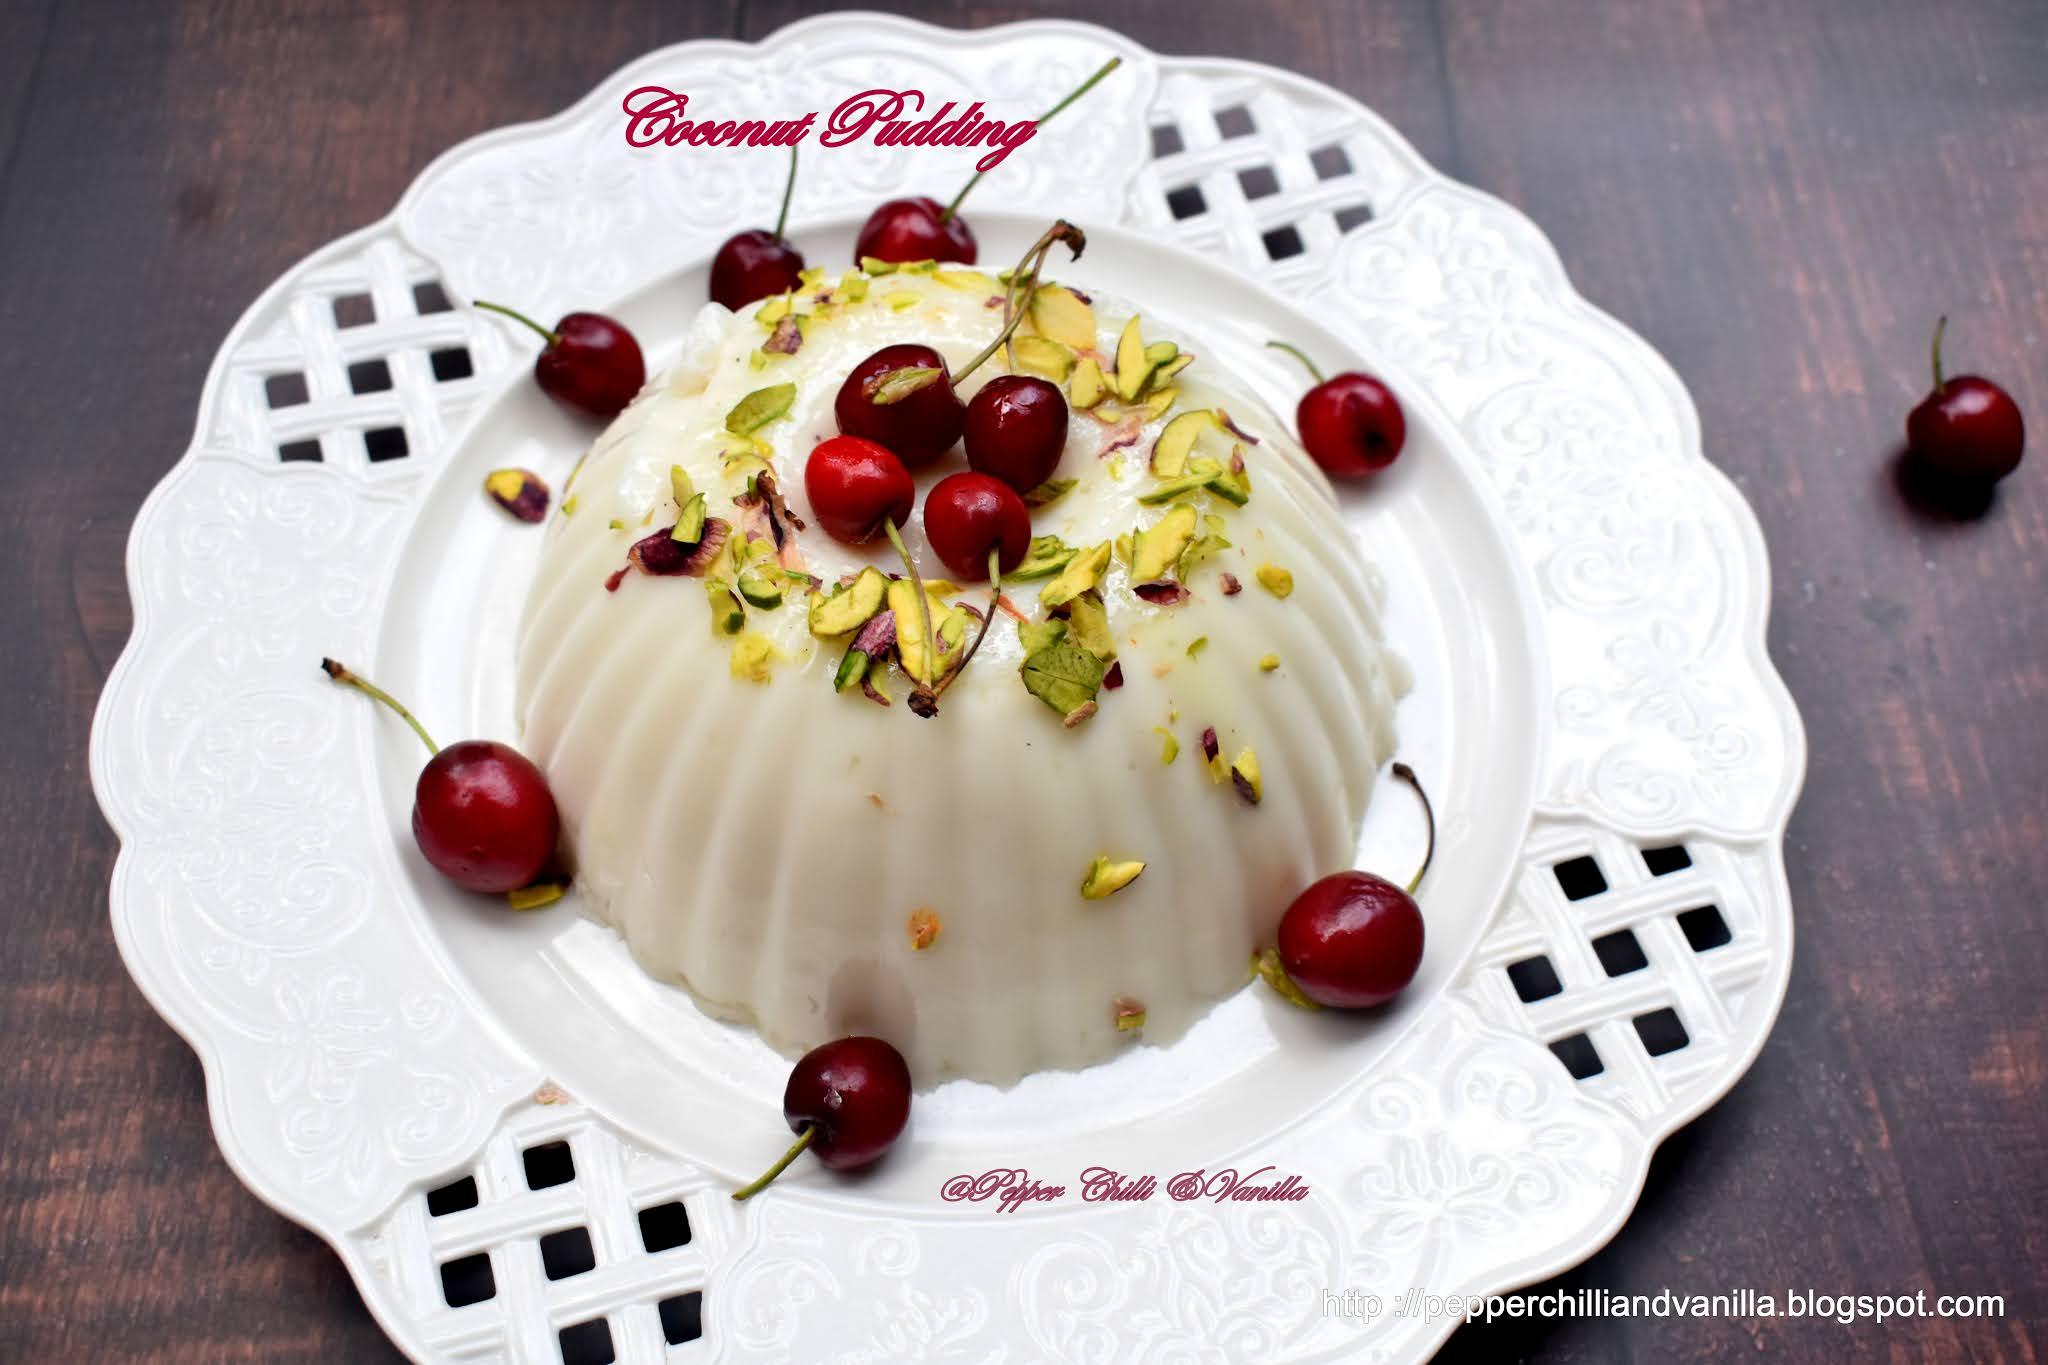 Coconut pudding recipe,elaneer pudding ,tender coconut pudding